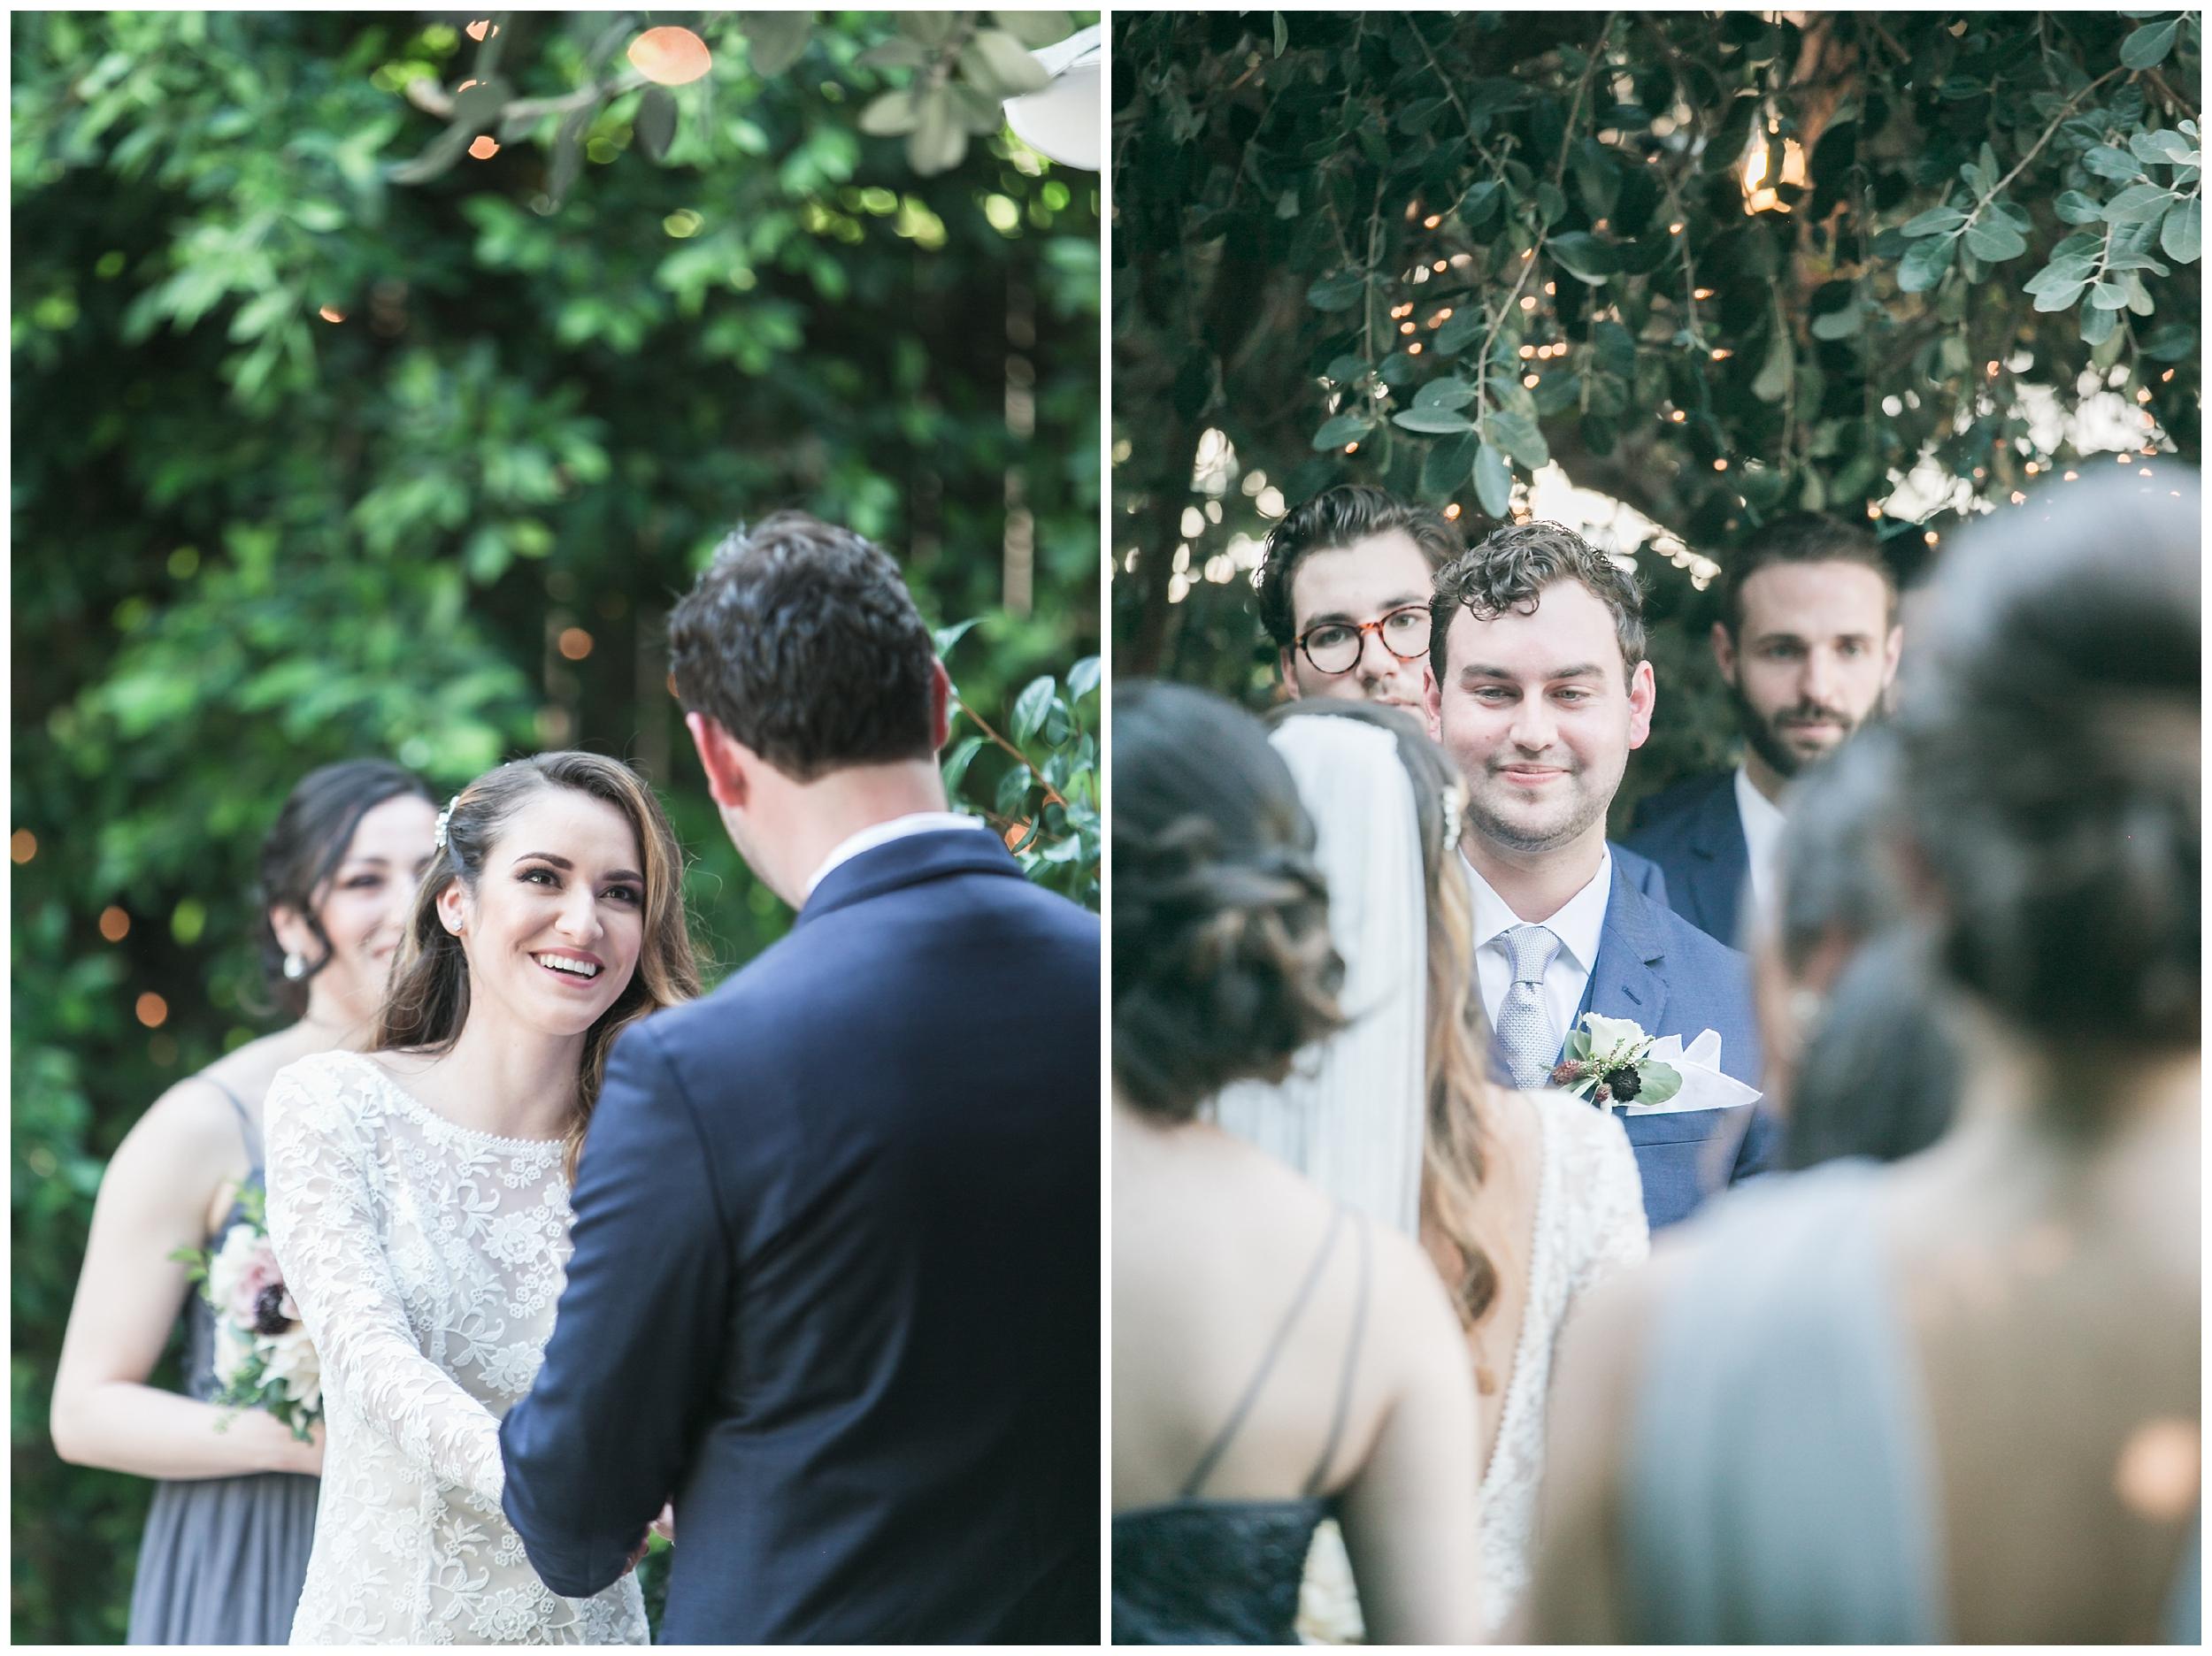 chic-christmas-house-wedding-ceremony-carrie-vines-008.jpg